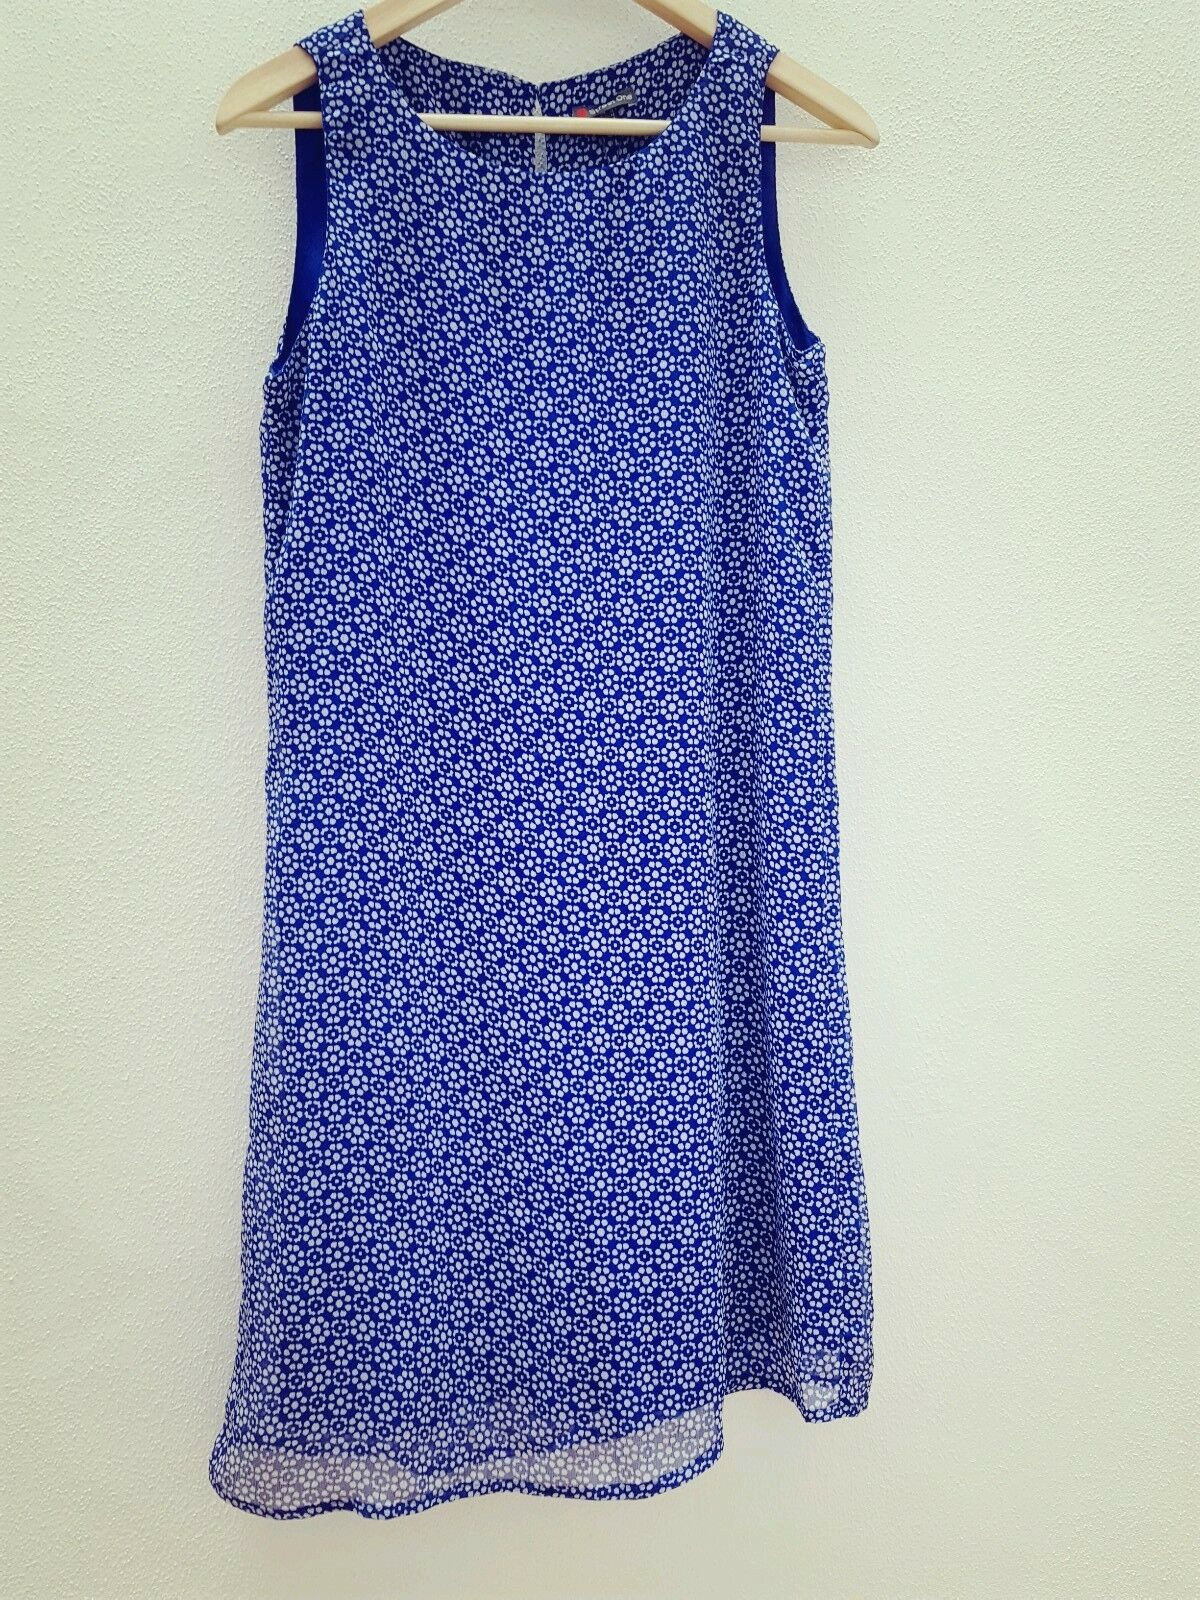 Street one Damen Kleid Longtop blau weiß Gr.34 XS NEU